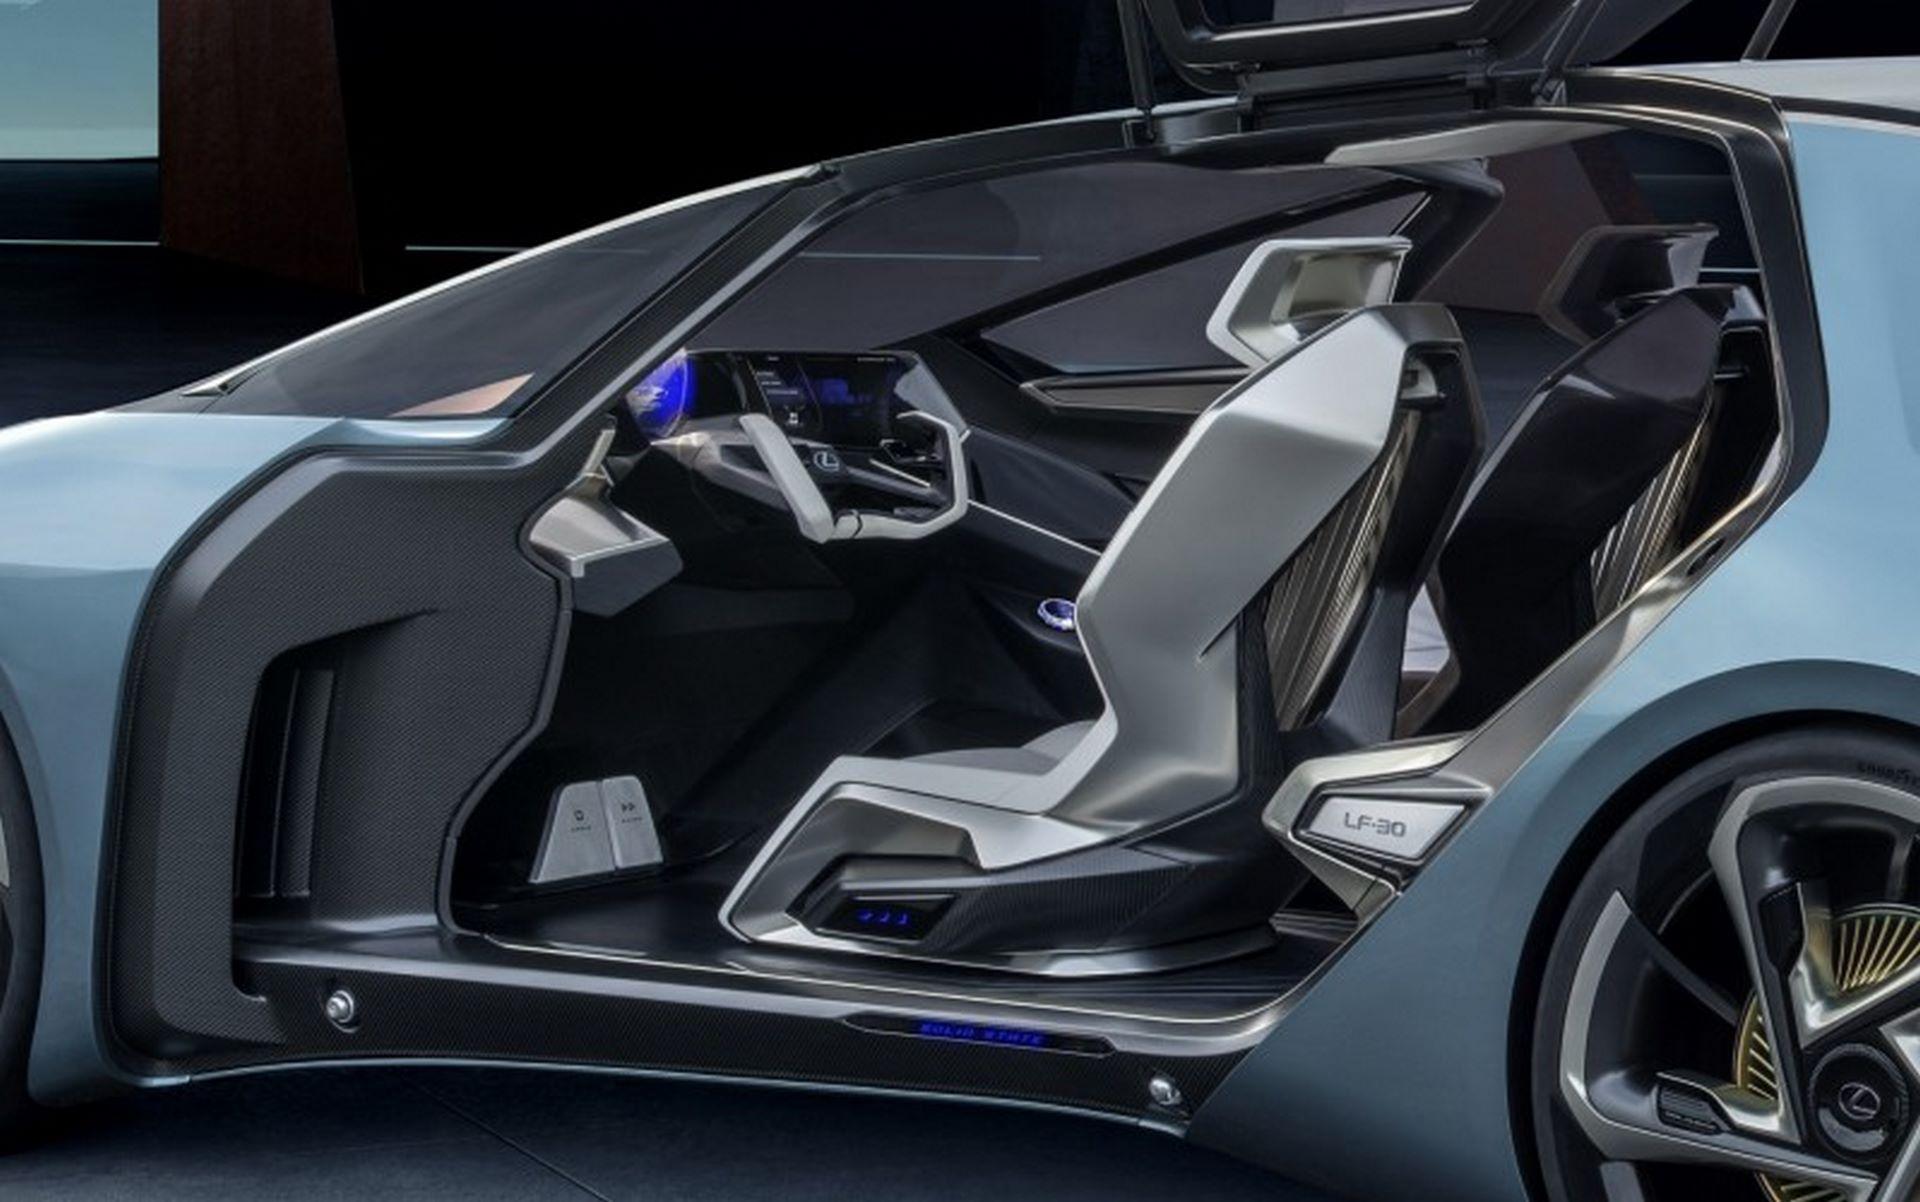 Lexus-LF-30-Concept-31